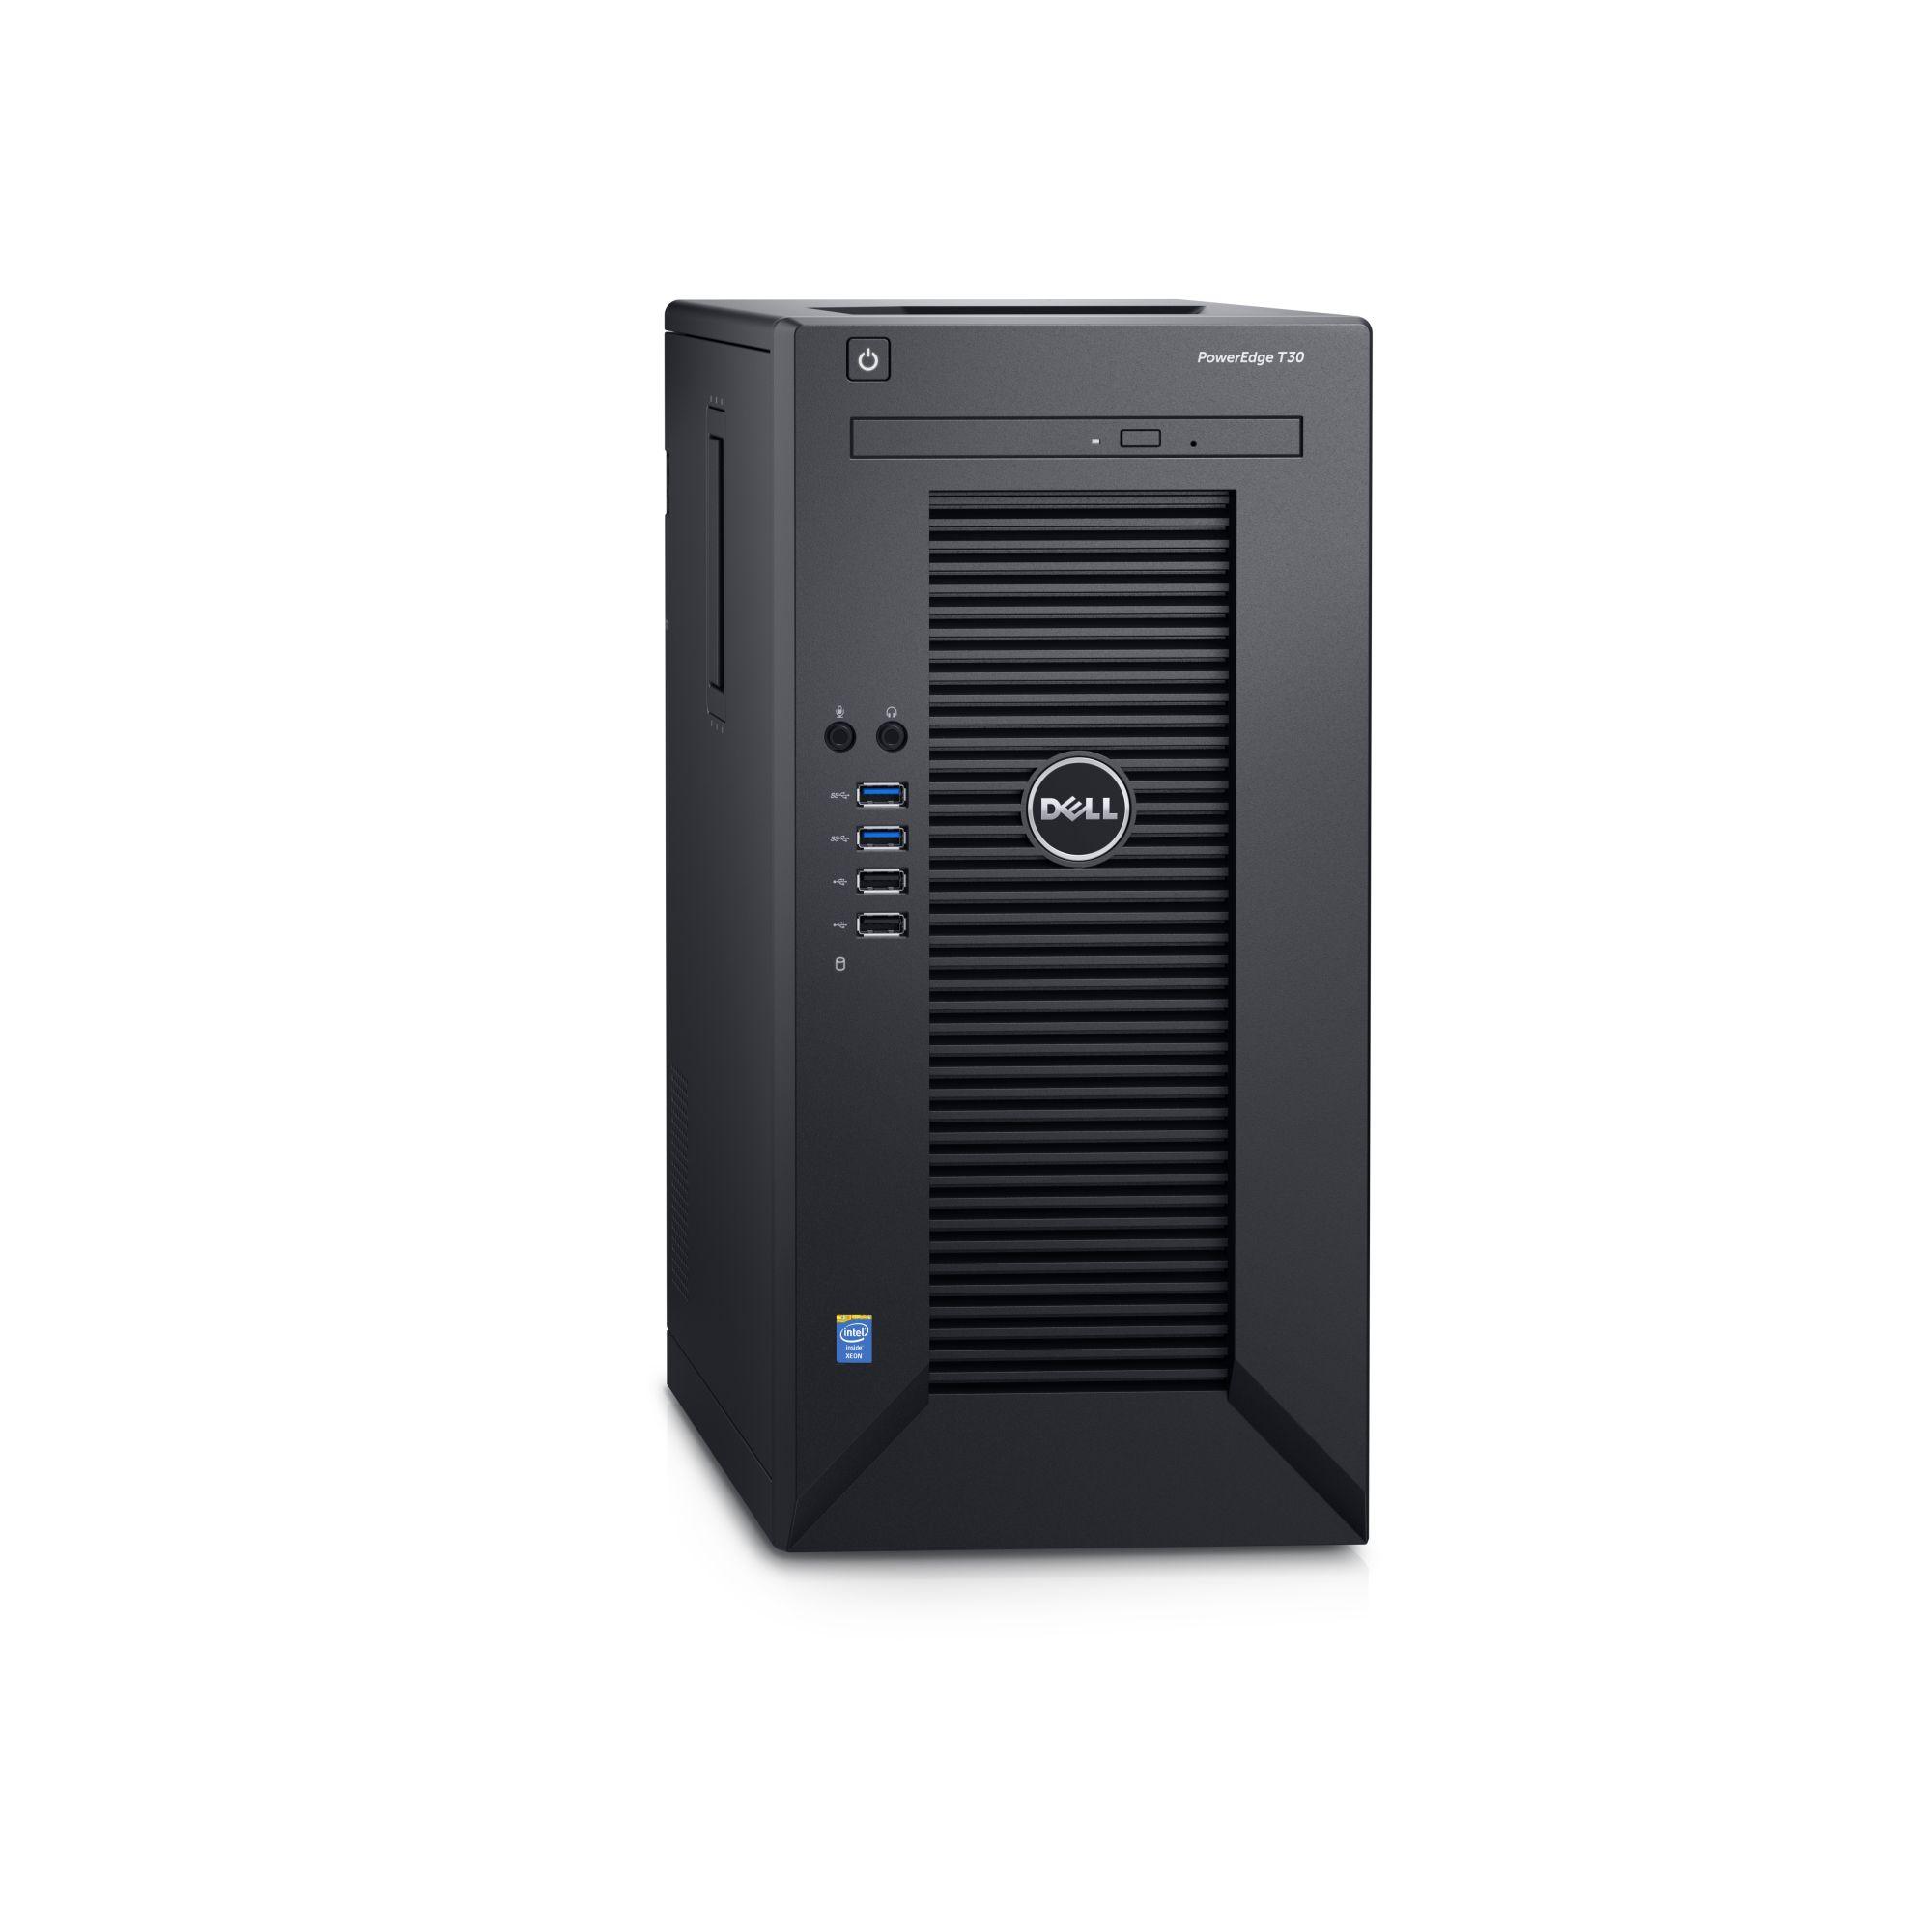 Dell PowerEdge T30 E3-1225 v5/8GB/2x2TB SATA/RAID 1/DVDRW/1xGLAN/290W/3RNBD/Černý